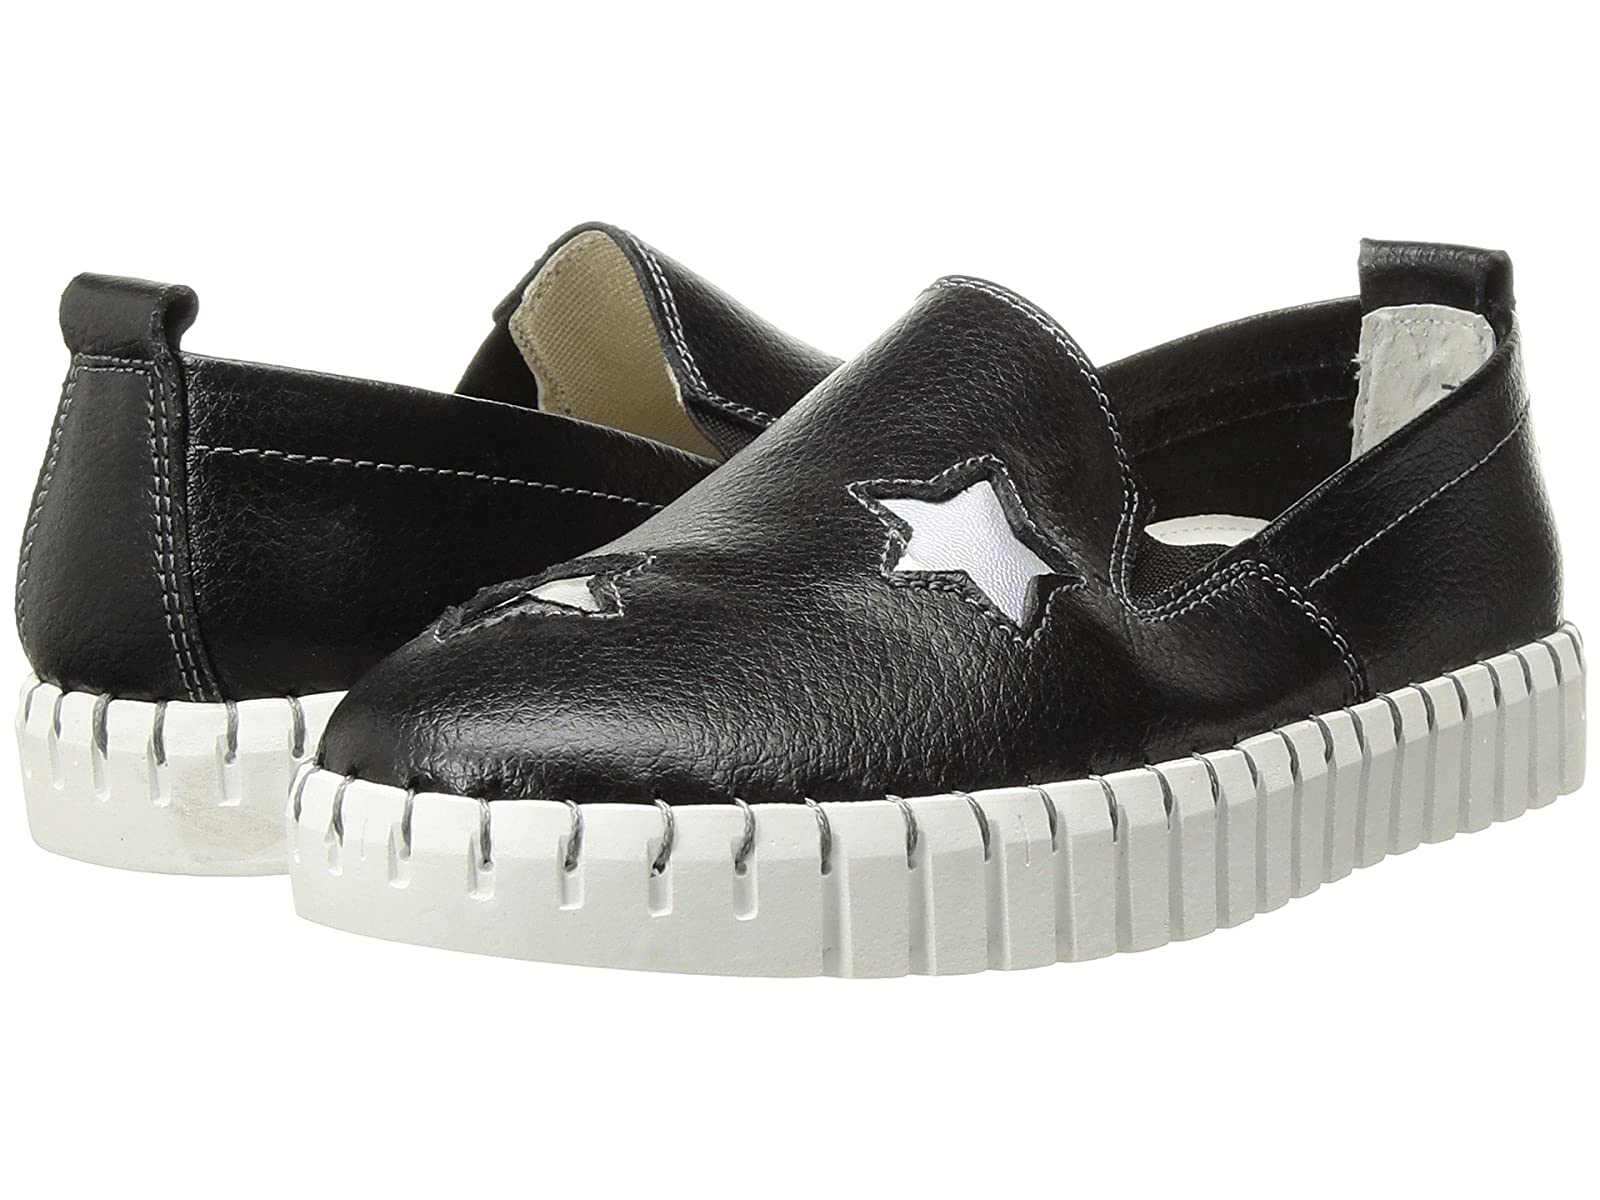 bernie mev. Kids Twk37 (Little Kid/Big Kid)Atmospheric grades have affordable shoes